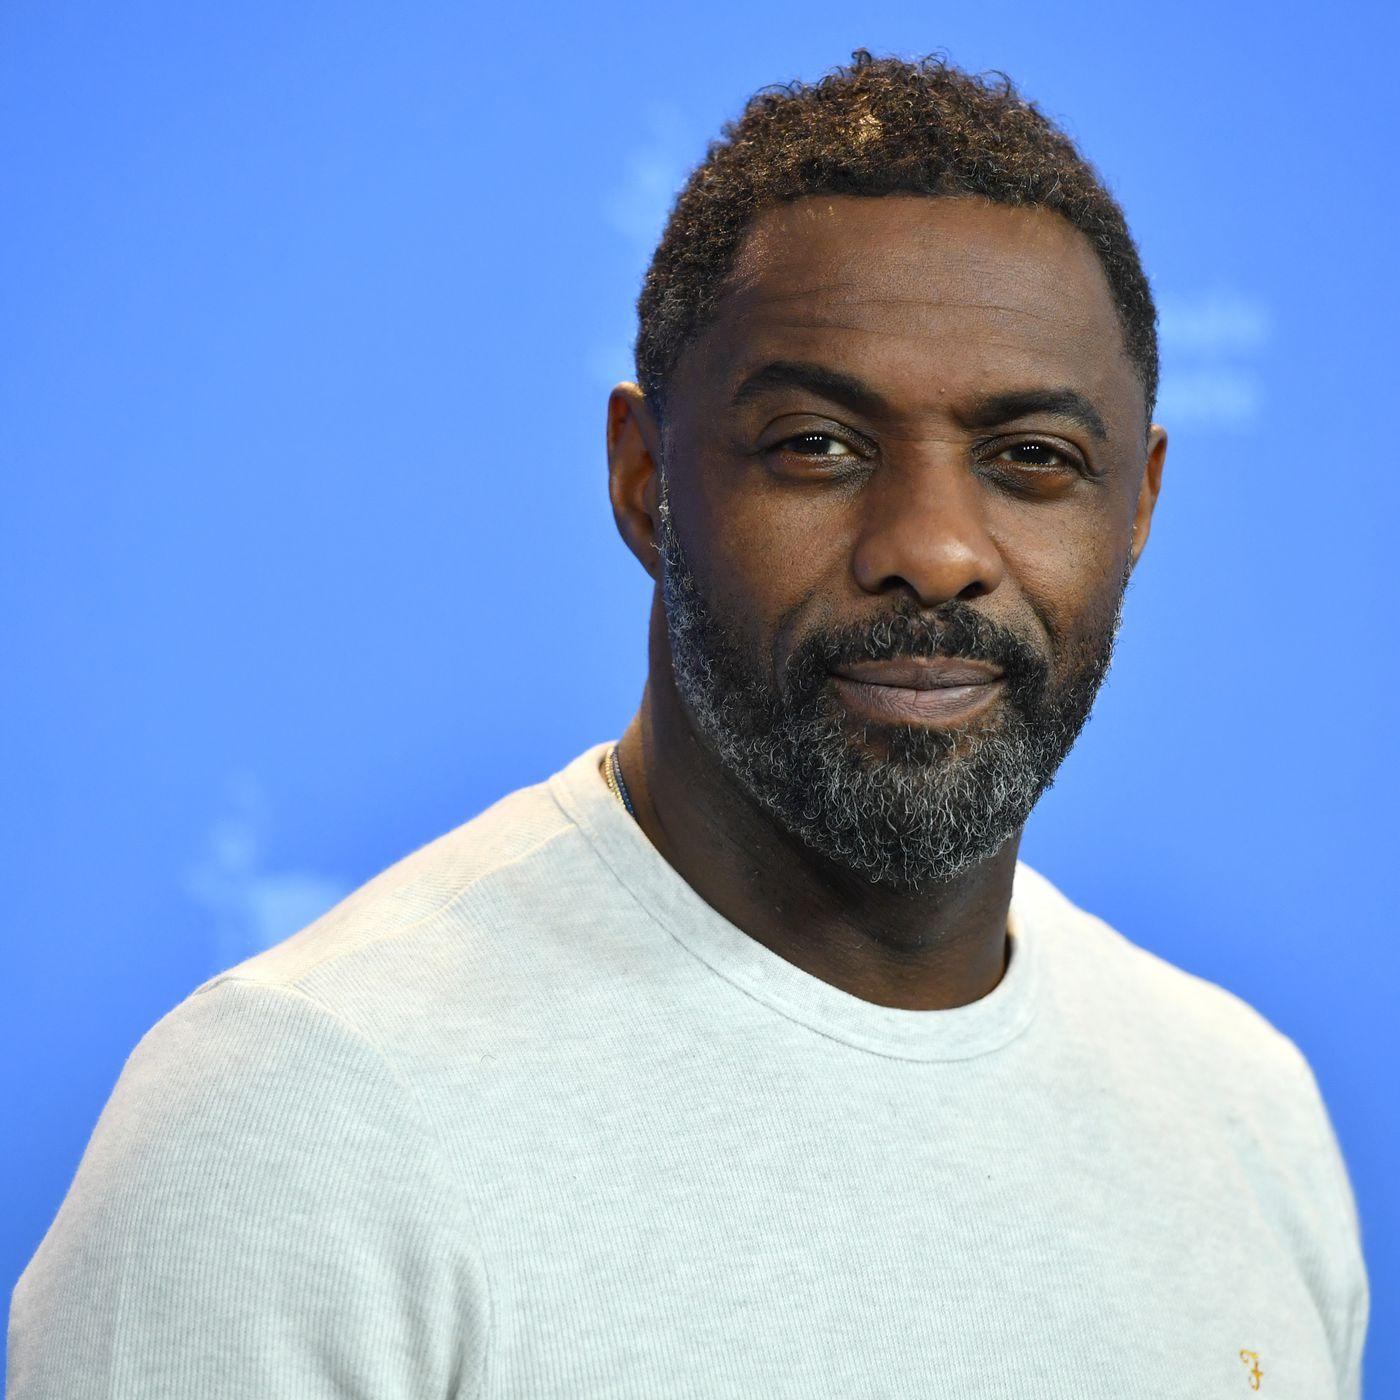 Idris Elba Is 2018 S Sexiest Man Alive Says People Magazine Vox